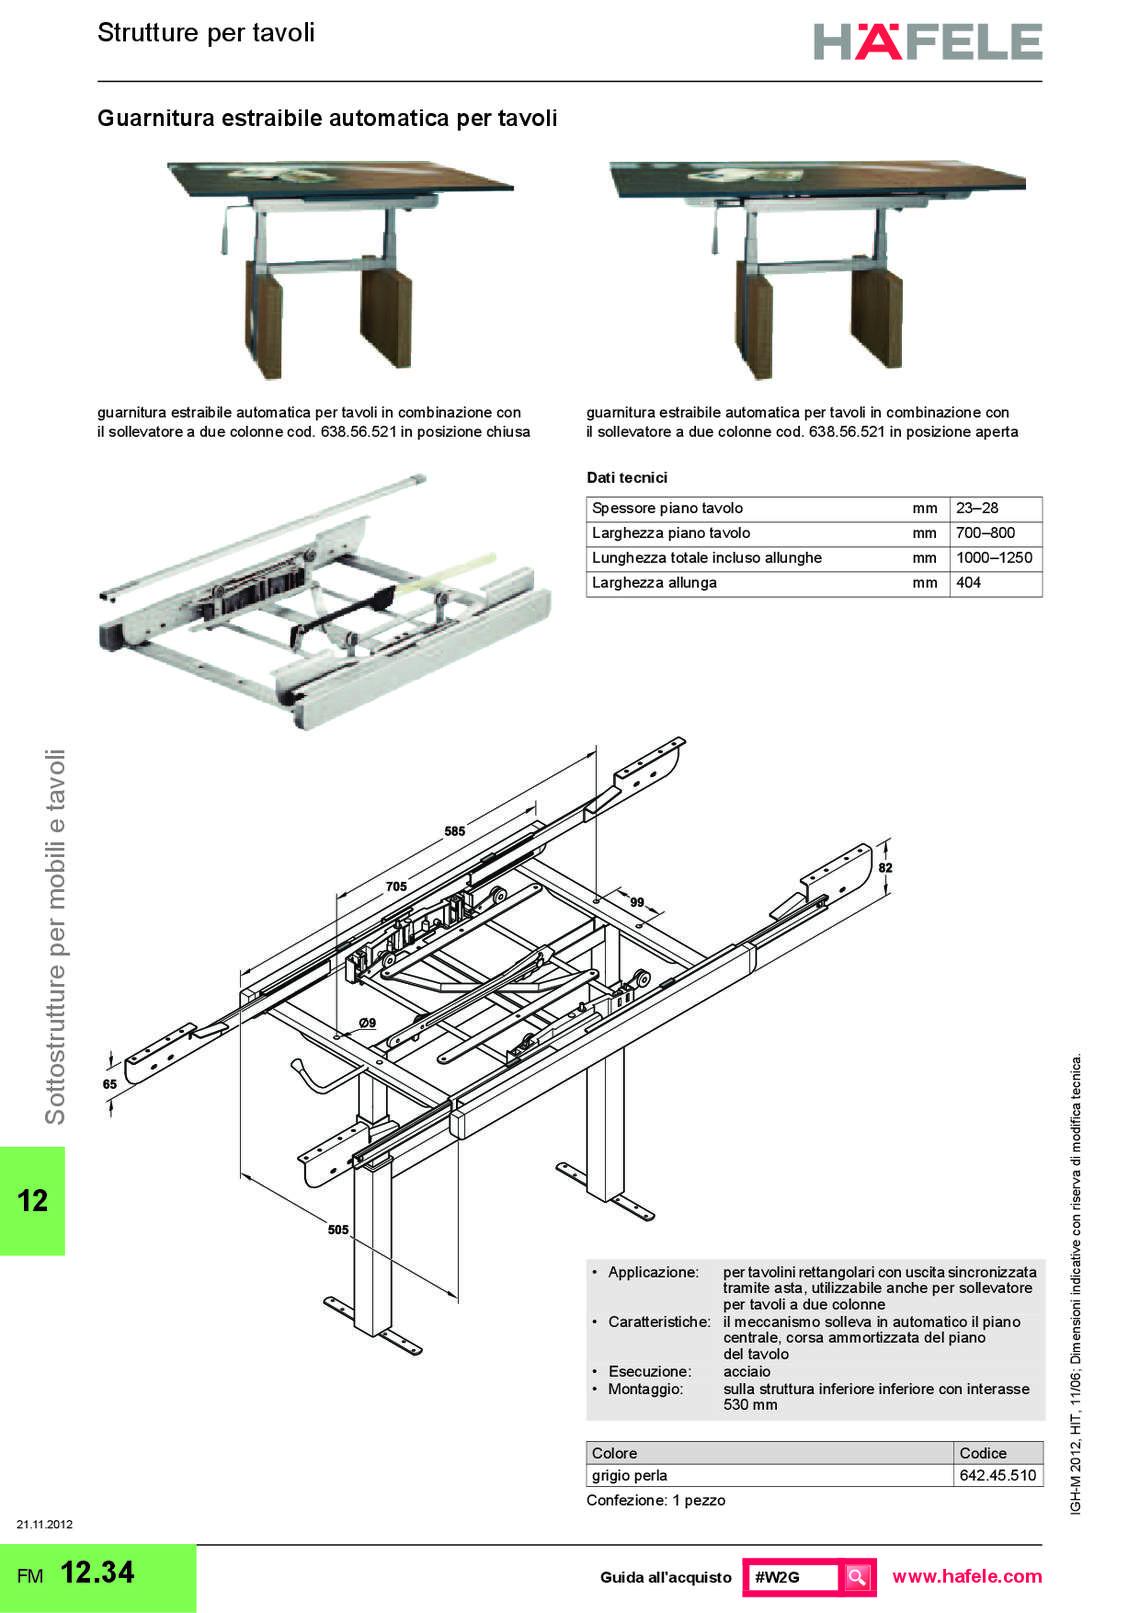 hafele-sottostrutture-per-mobili_83_057.jpg